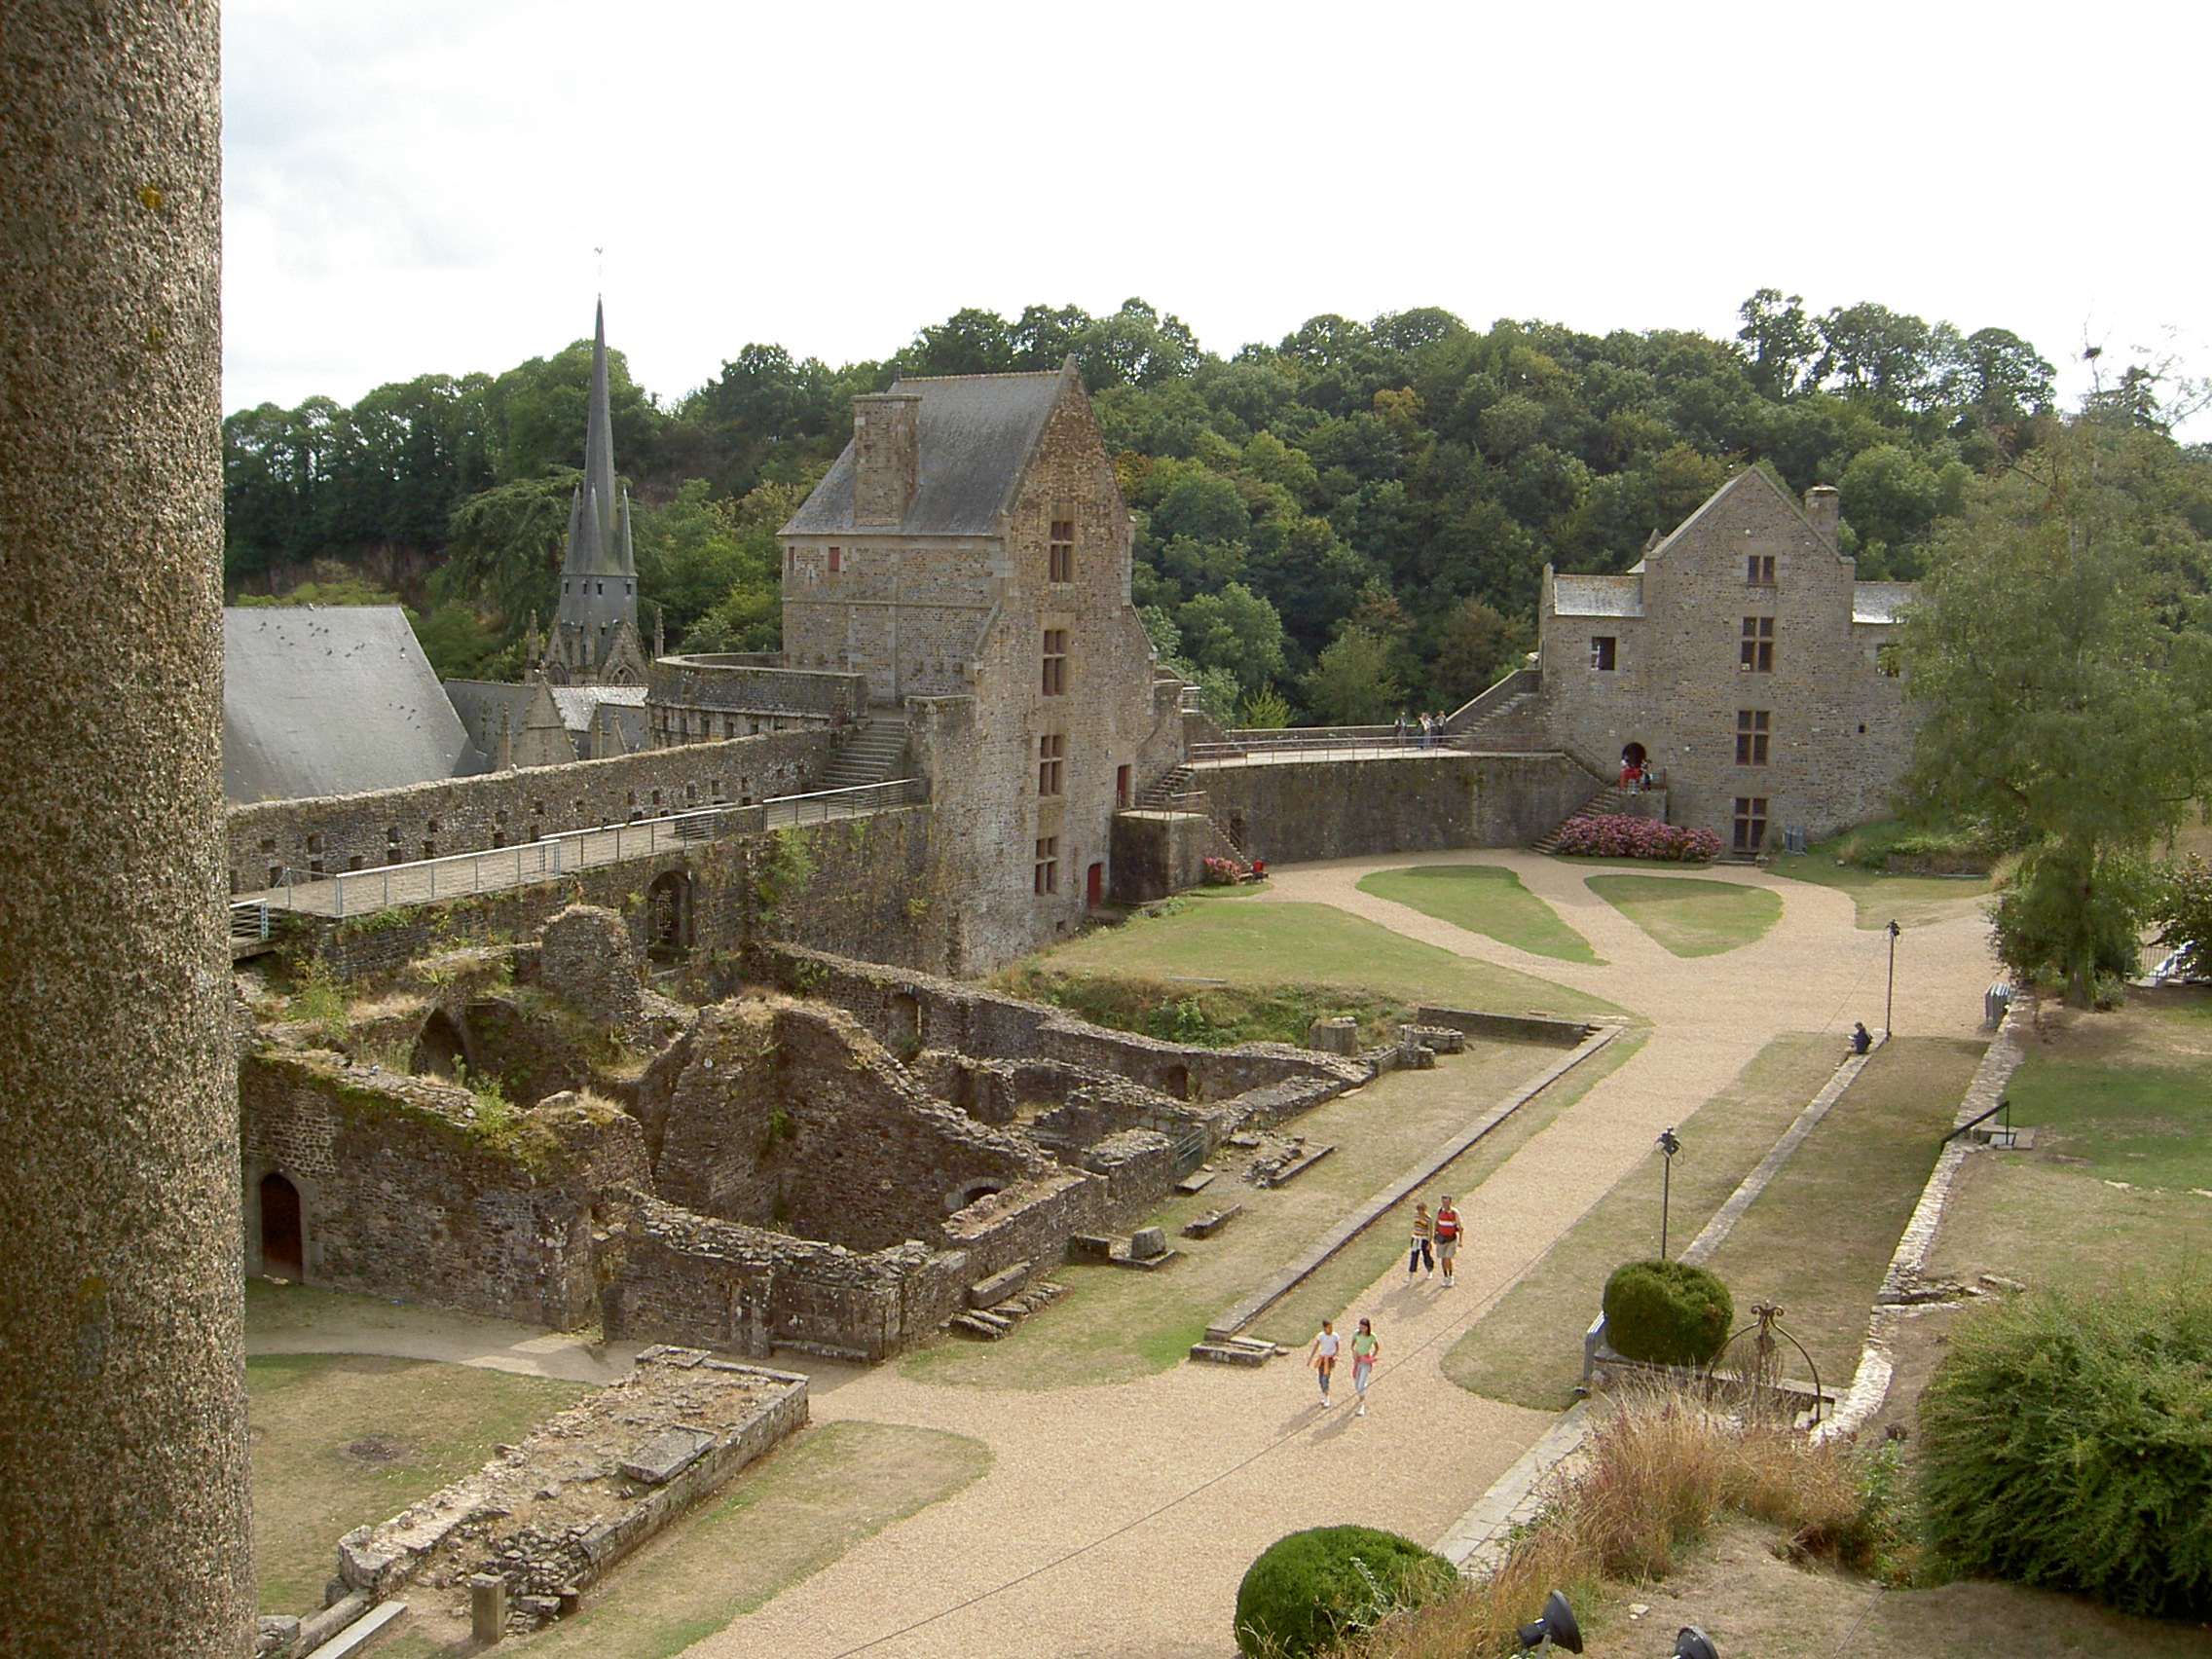 Fougeres France  city photos gallery : Chateau de Fougeres Bretagne, France 09